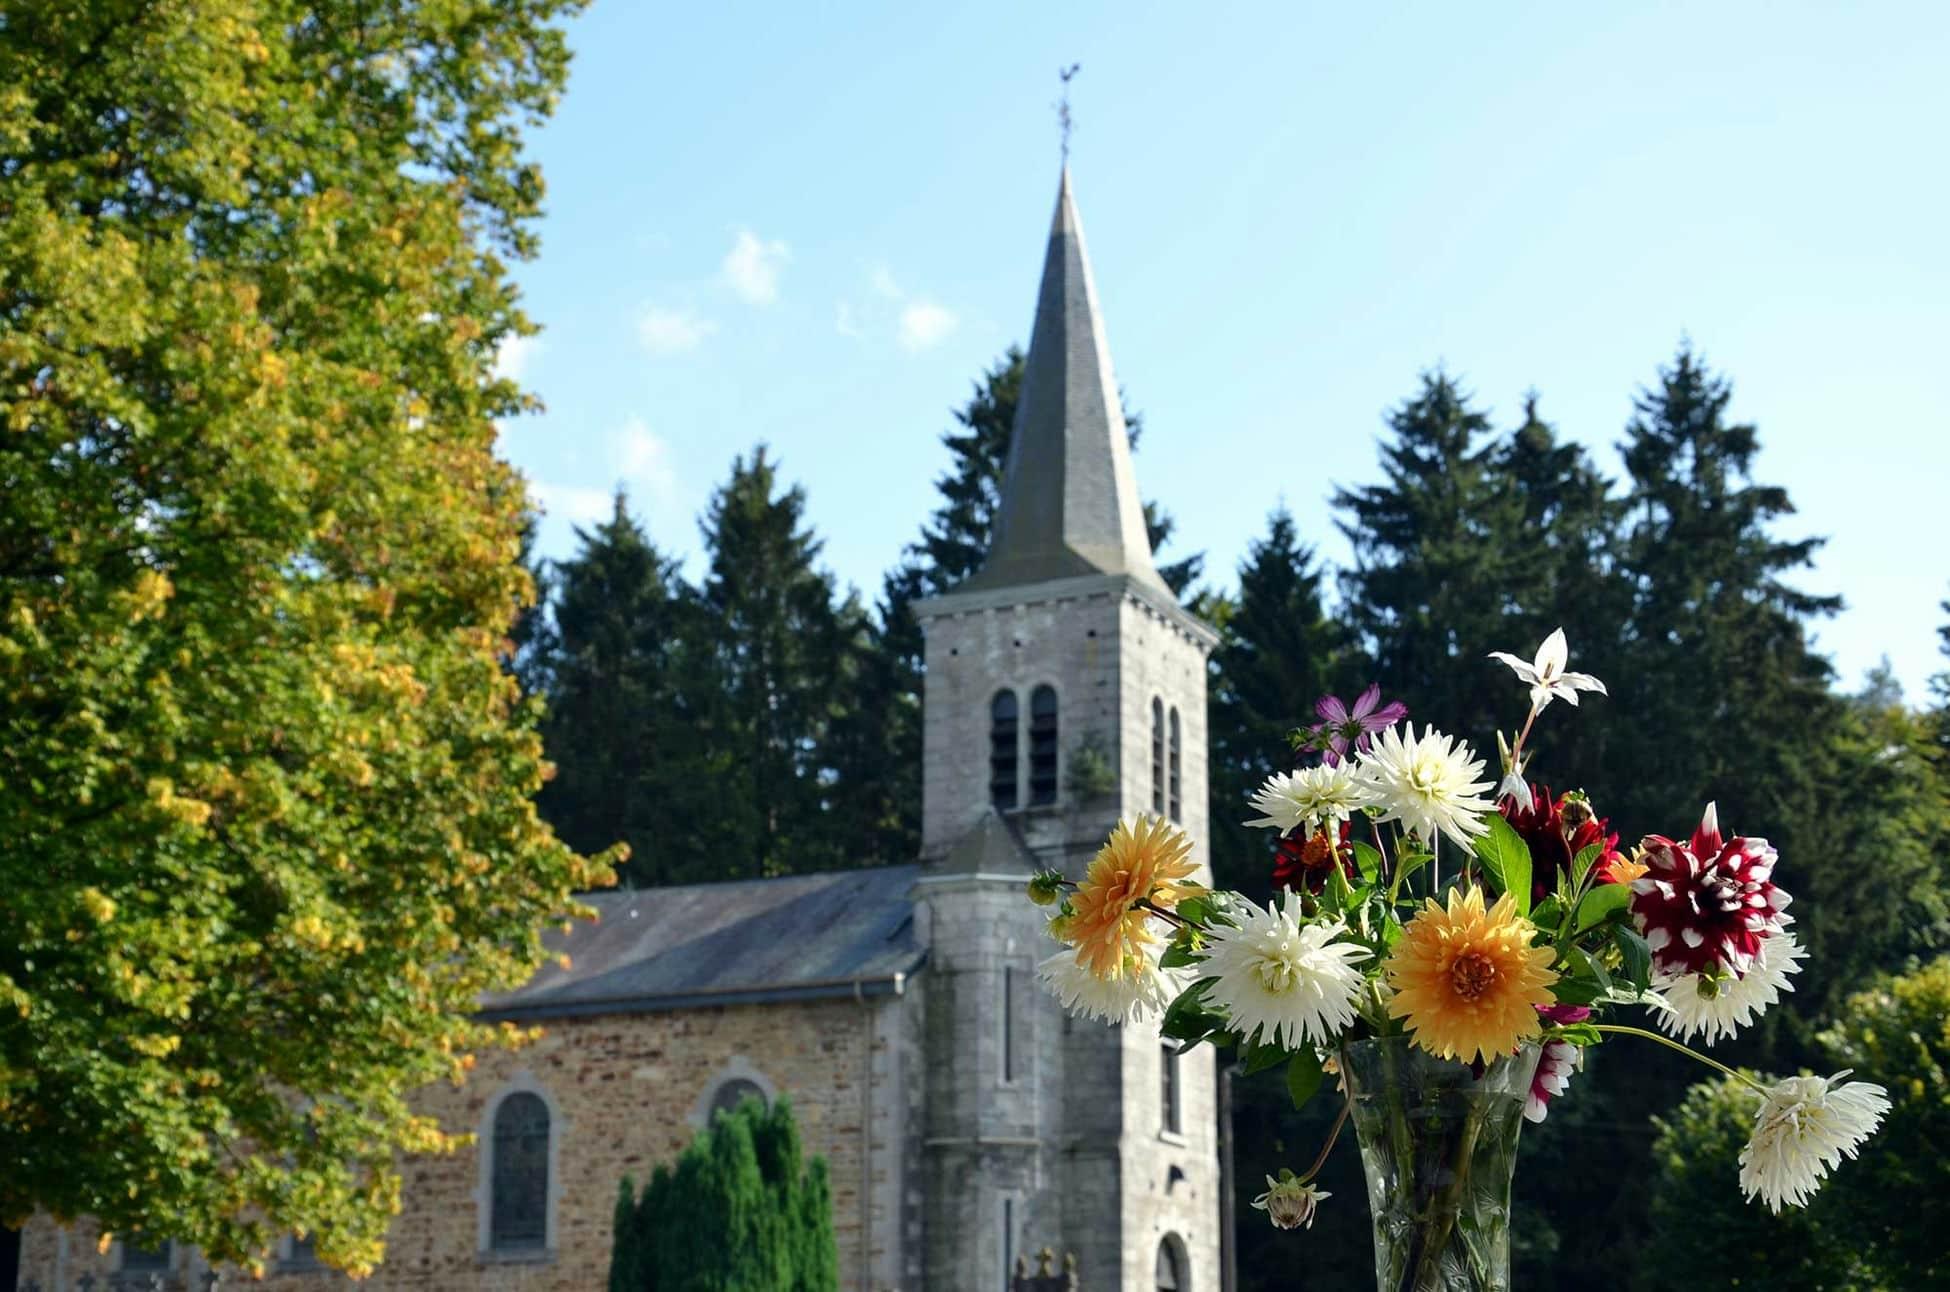 ardenne residences harre 6960 region landscapes church